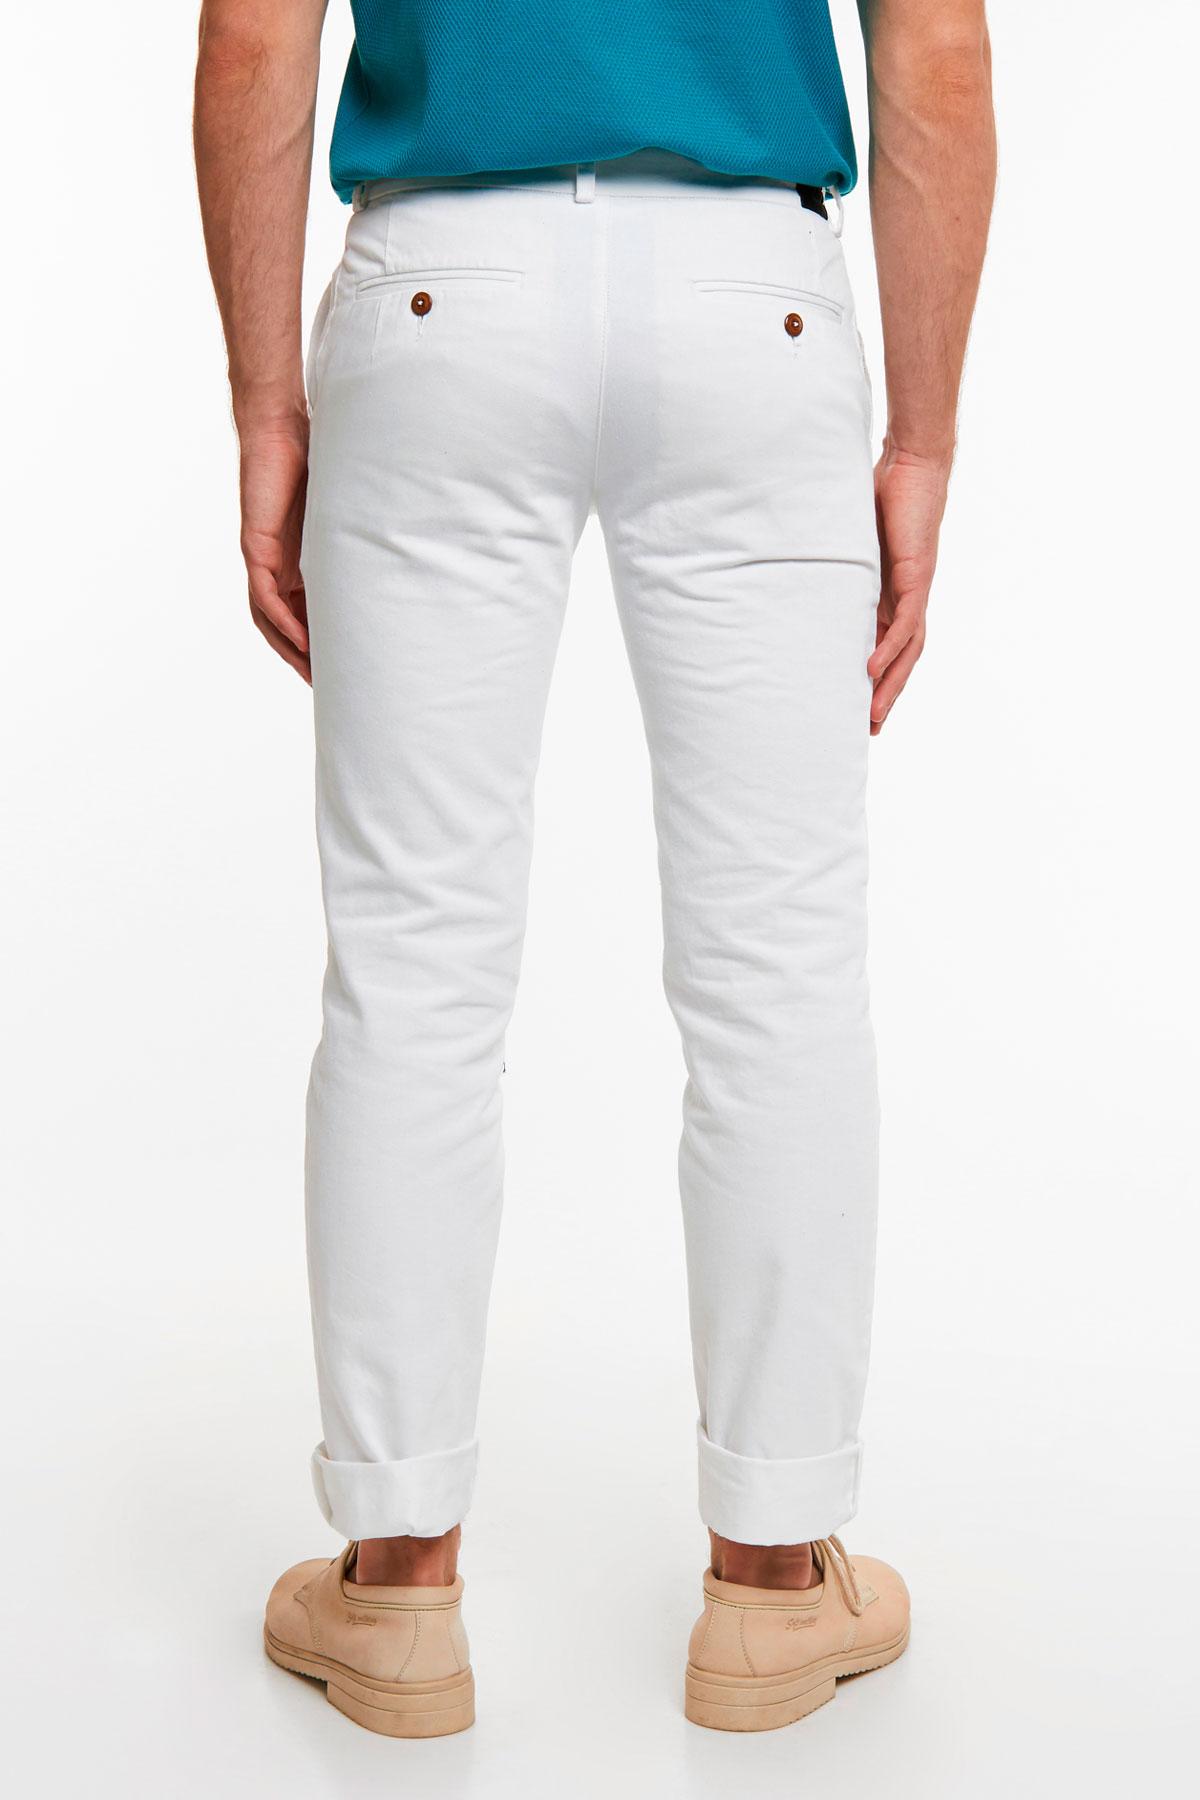 Брюки «chinos» белого цвета 18512 Milan-483